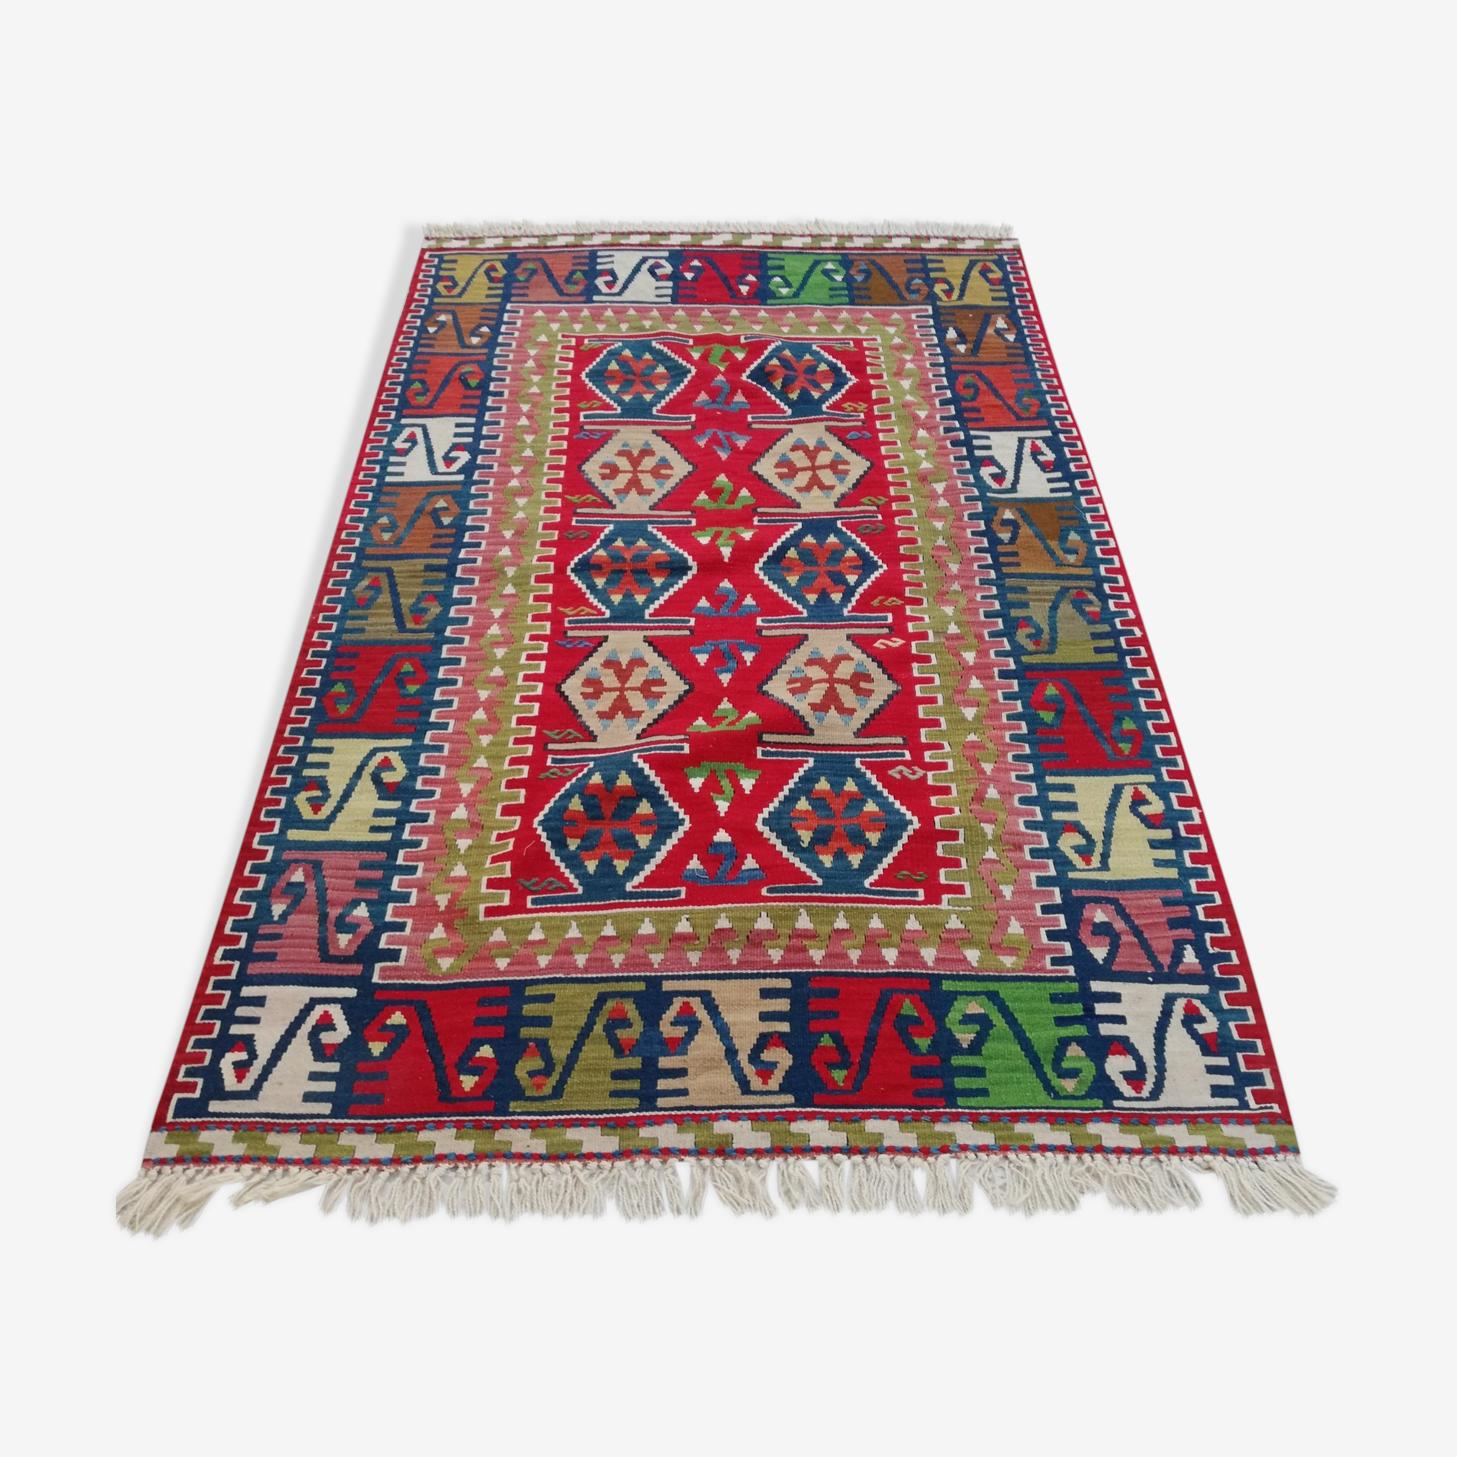 Tapis marocain berbère 200x130cm